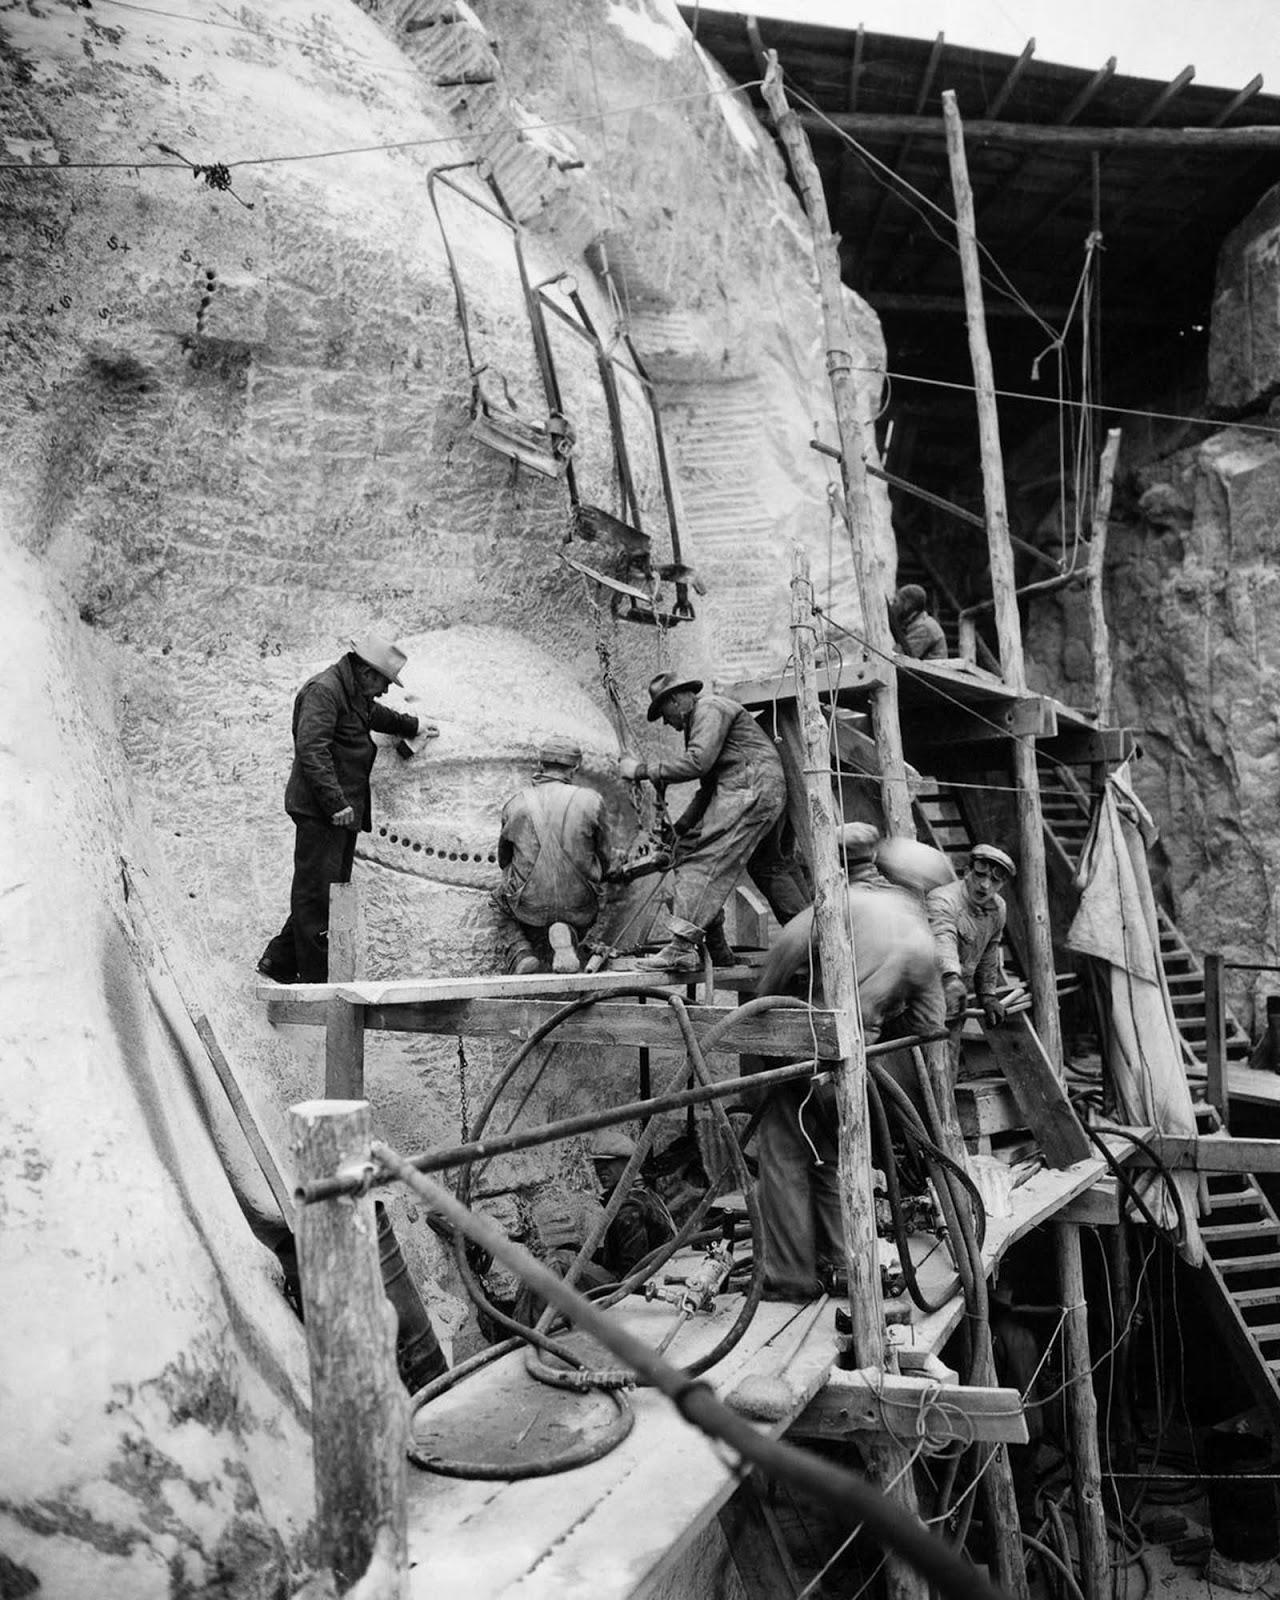 Sculptors work on Thomas Jefferson's eye. 1936.